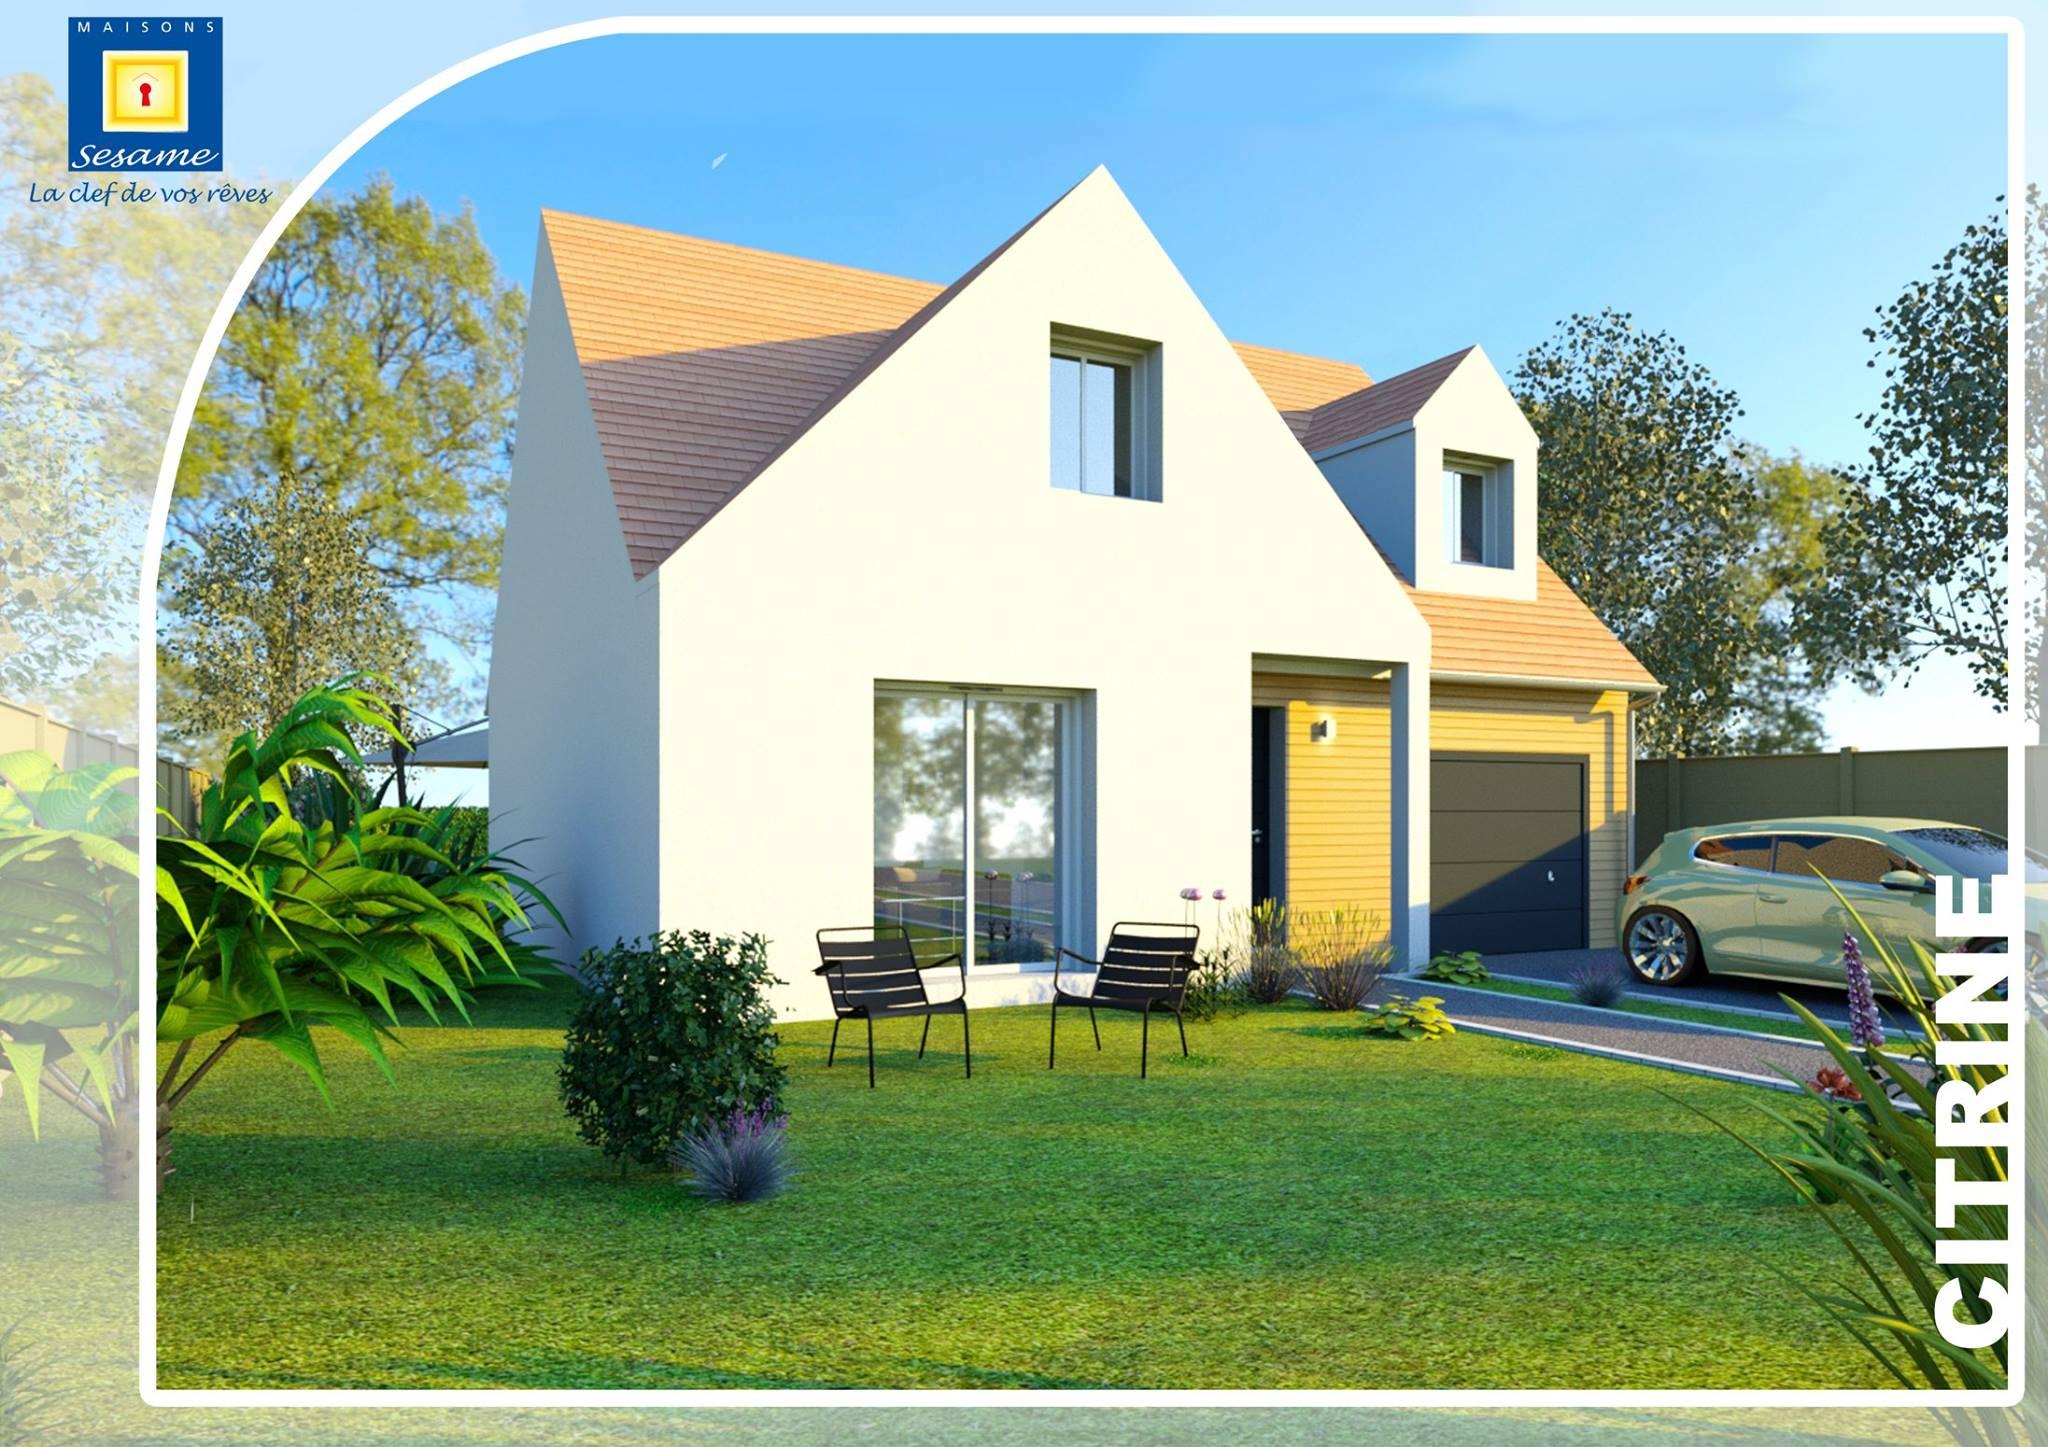 Interesting maison neuve toit plat with prix maison neuve m2 for Cout maison neuve m2